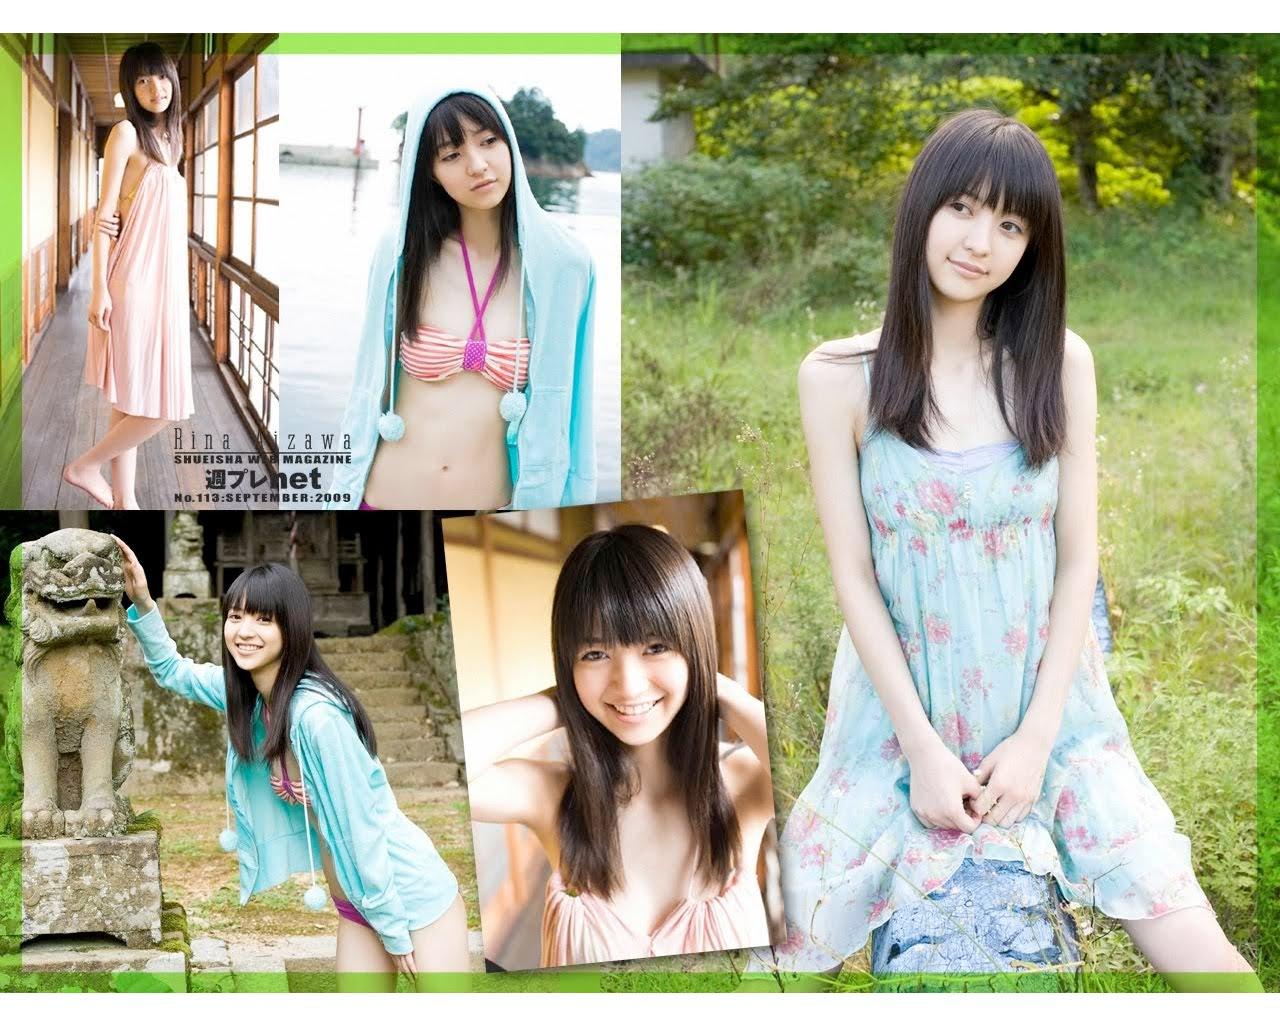 http://3.bp.blogspot.com/-YiPa5gaHXpQ/TX78R10DtOI/AAAAAAAAPDI/vfeZu9OoeRE/s1600/3.jpg